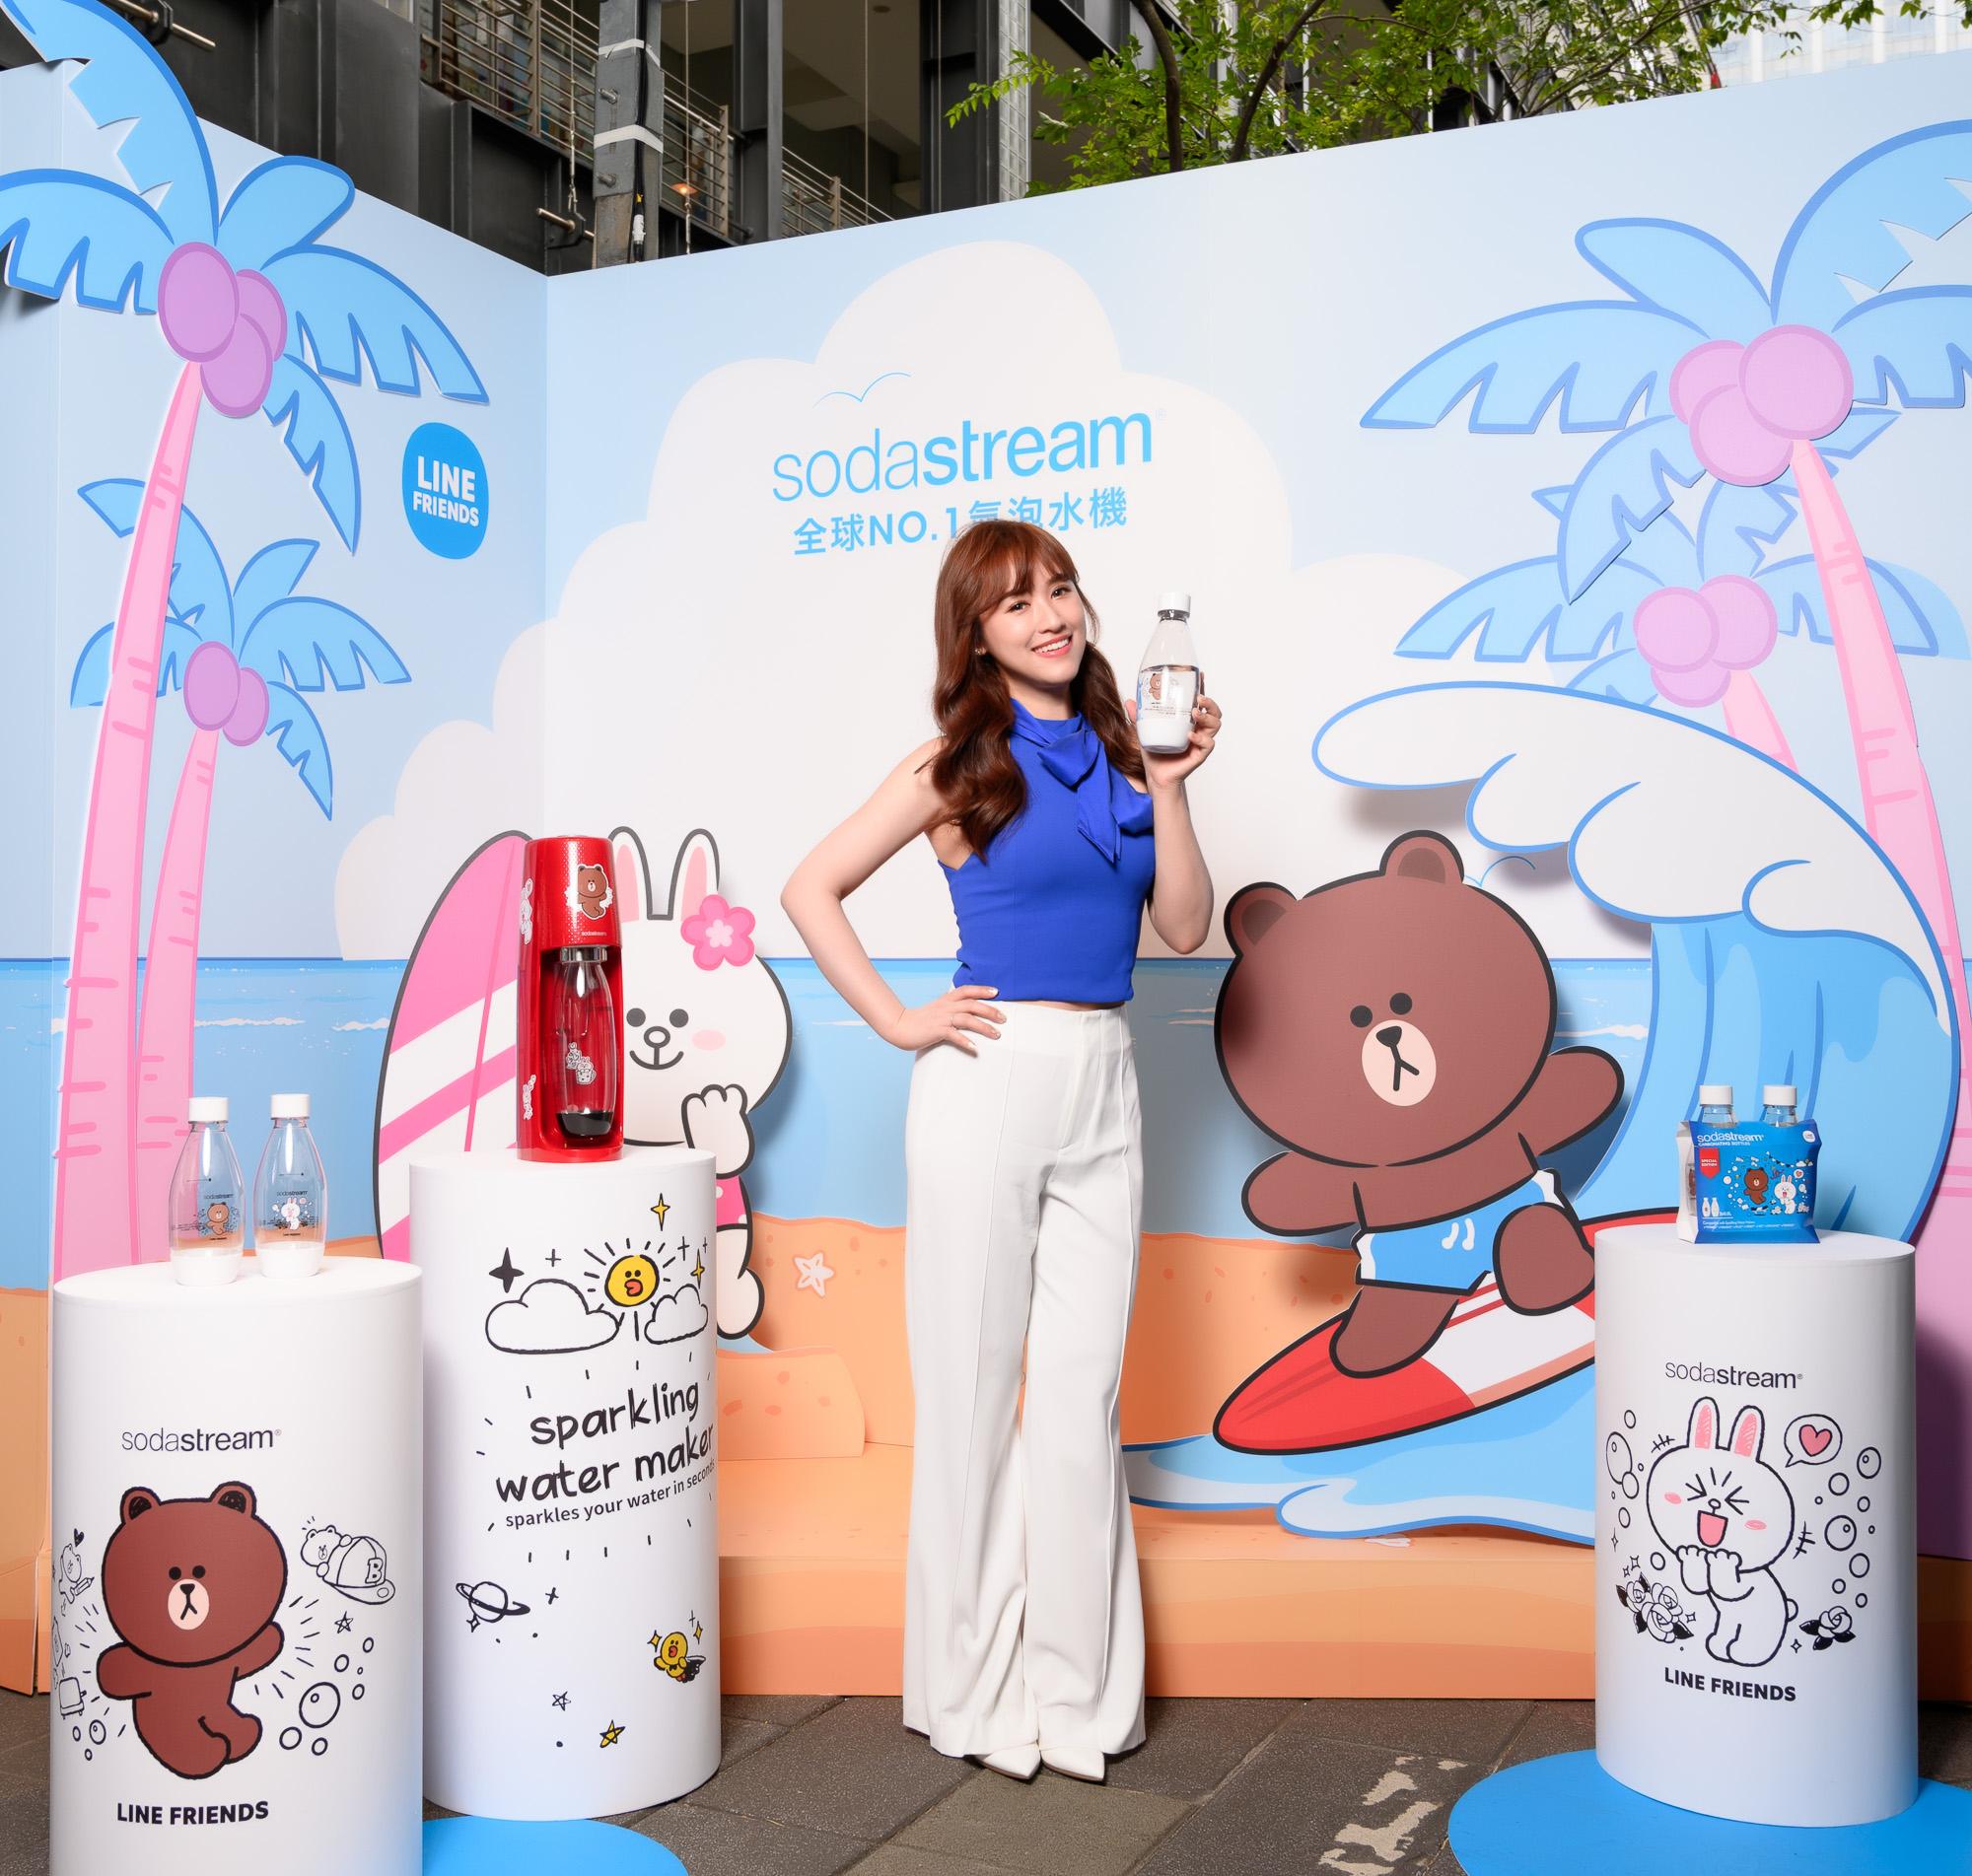 sodastream與LINE FRIENDS攜手合作,推出10週年限量款紀念款,讓熊大和兔兔能躍上sodastream專用水瓶和氣泡水機身上!